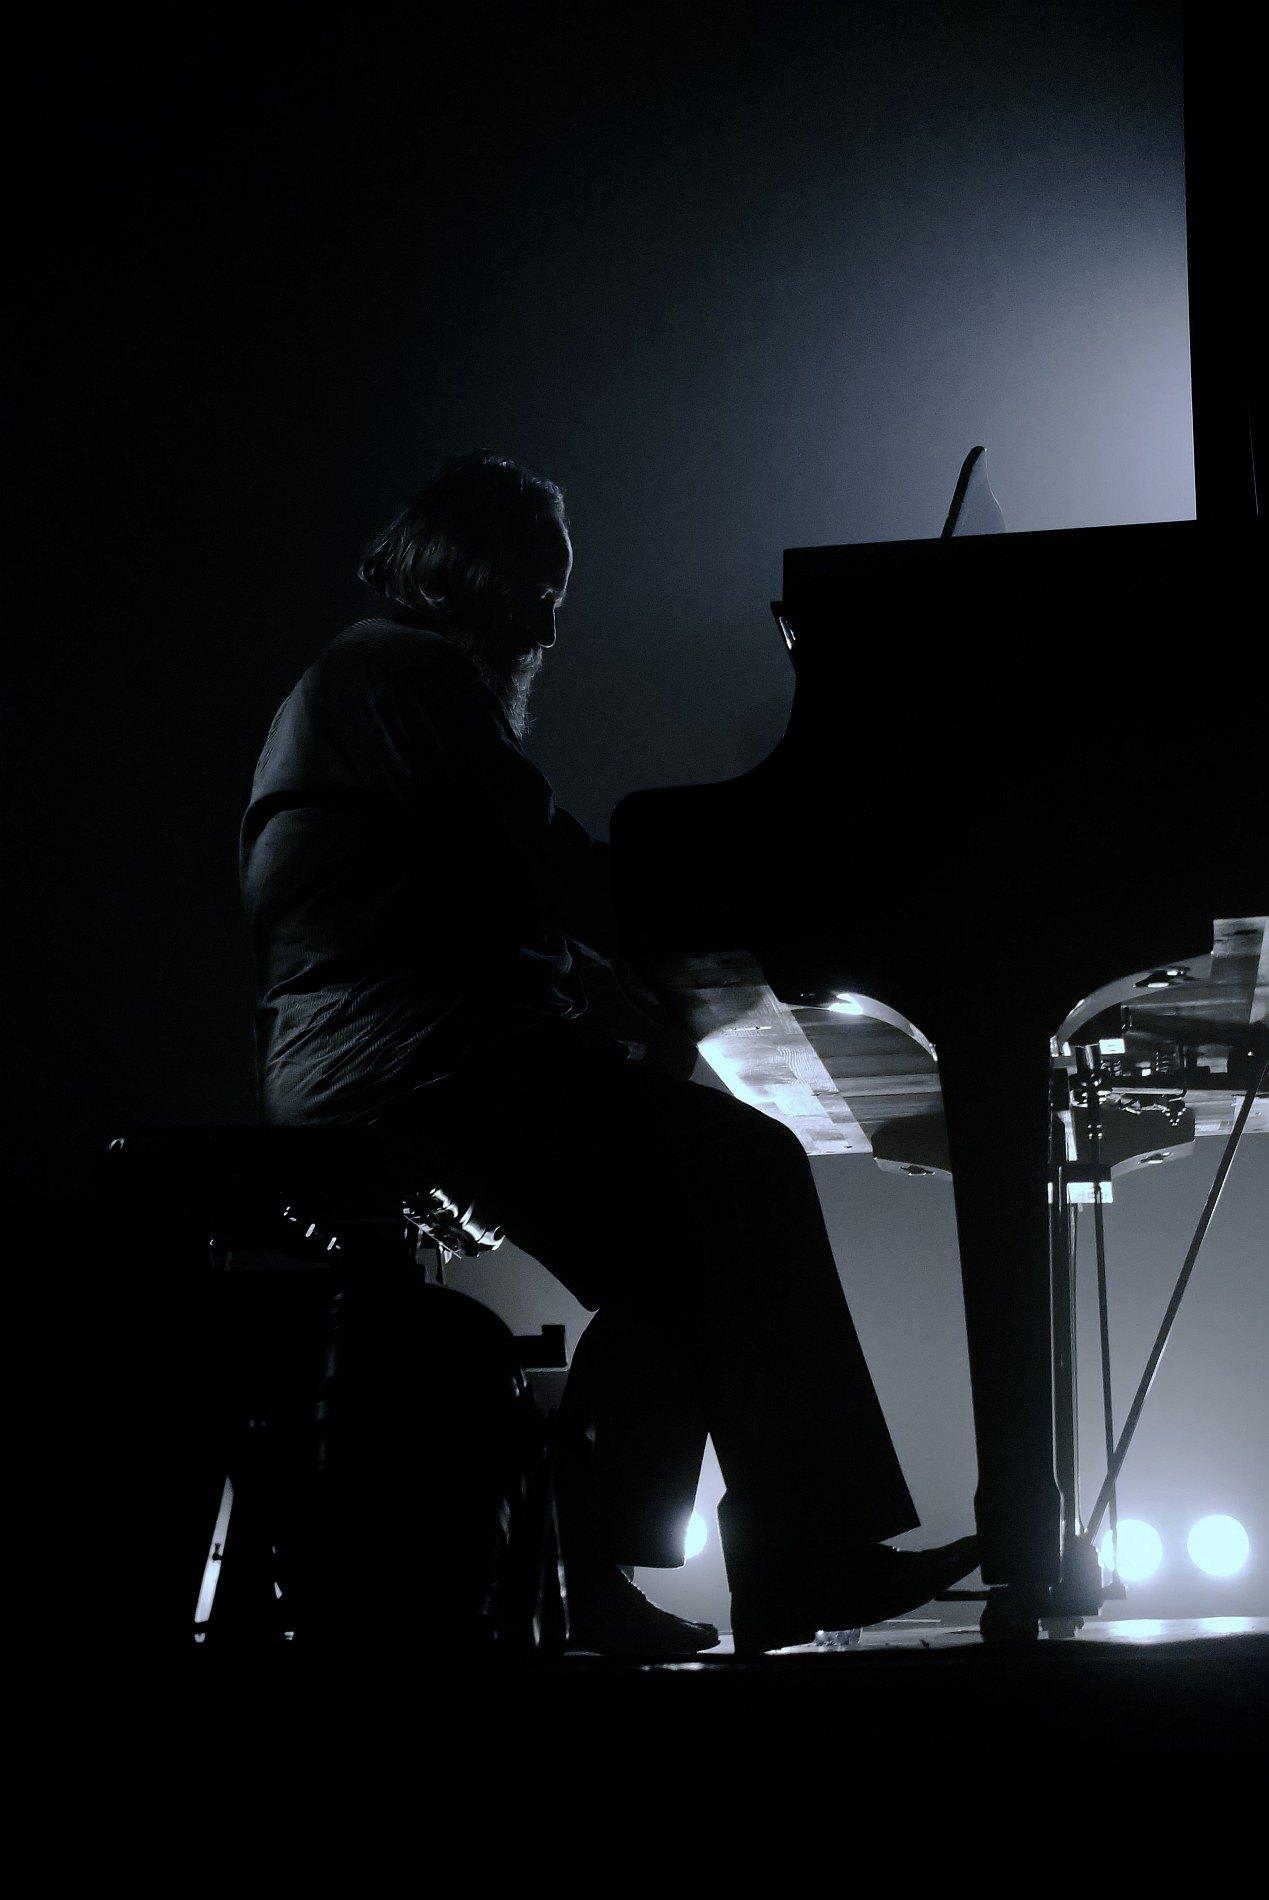 Lubomyr Melnyk, Beatpol II